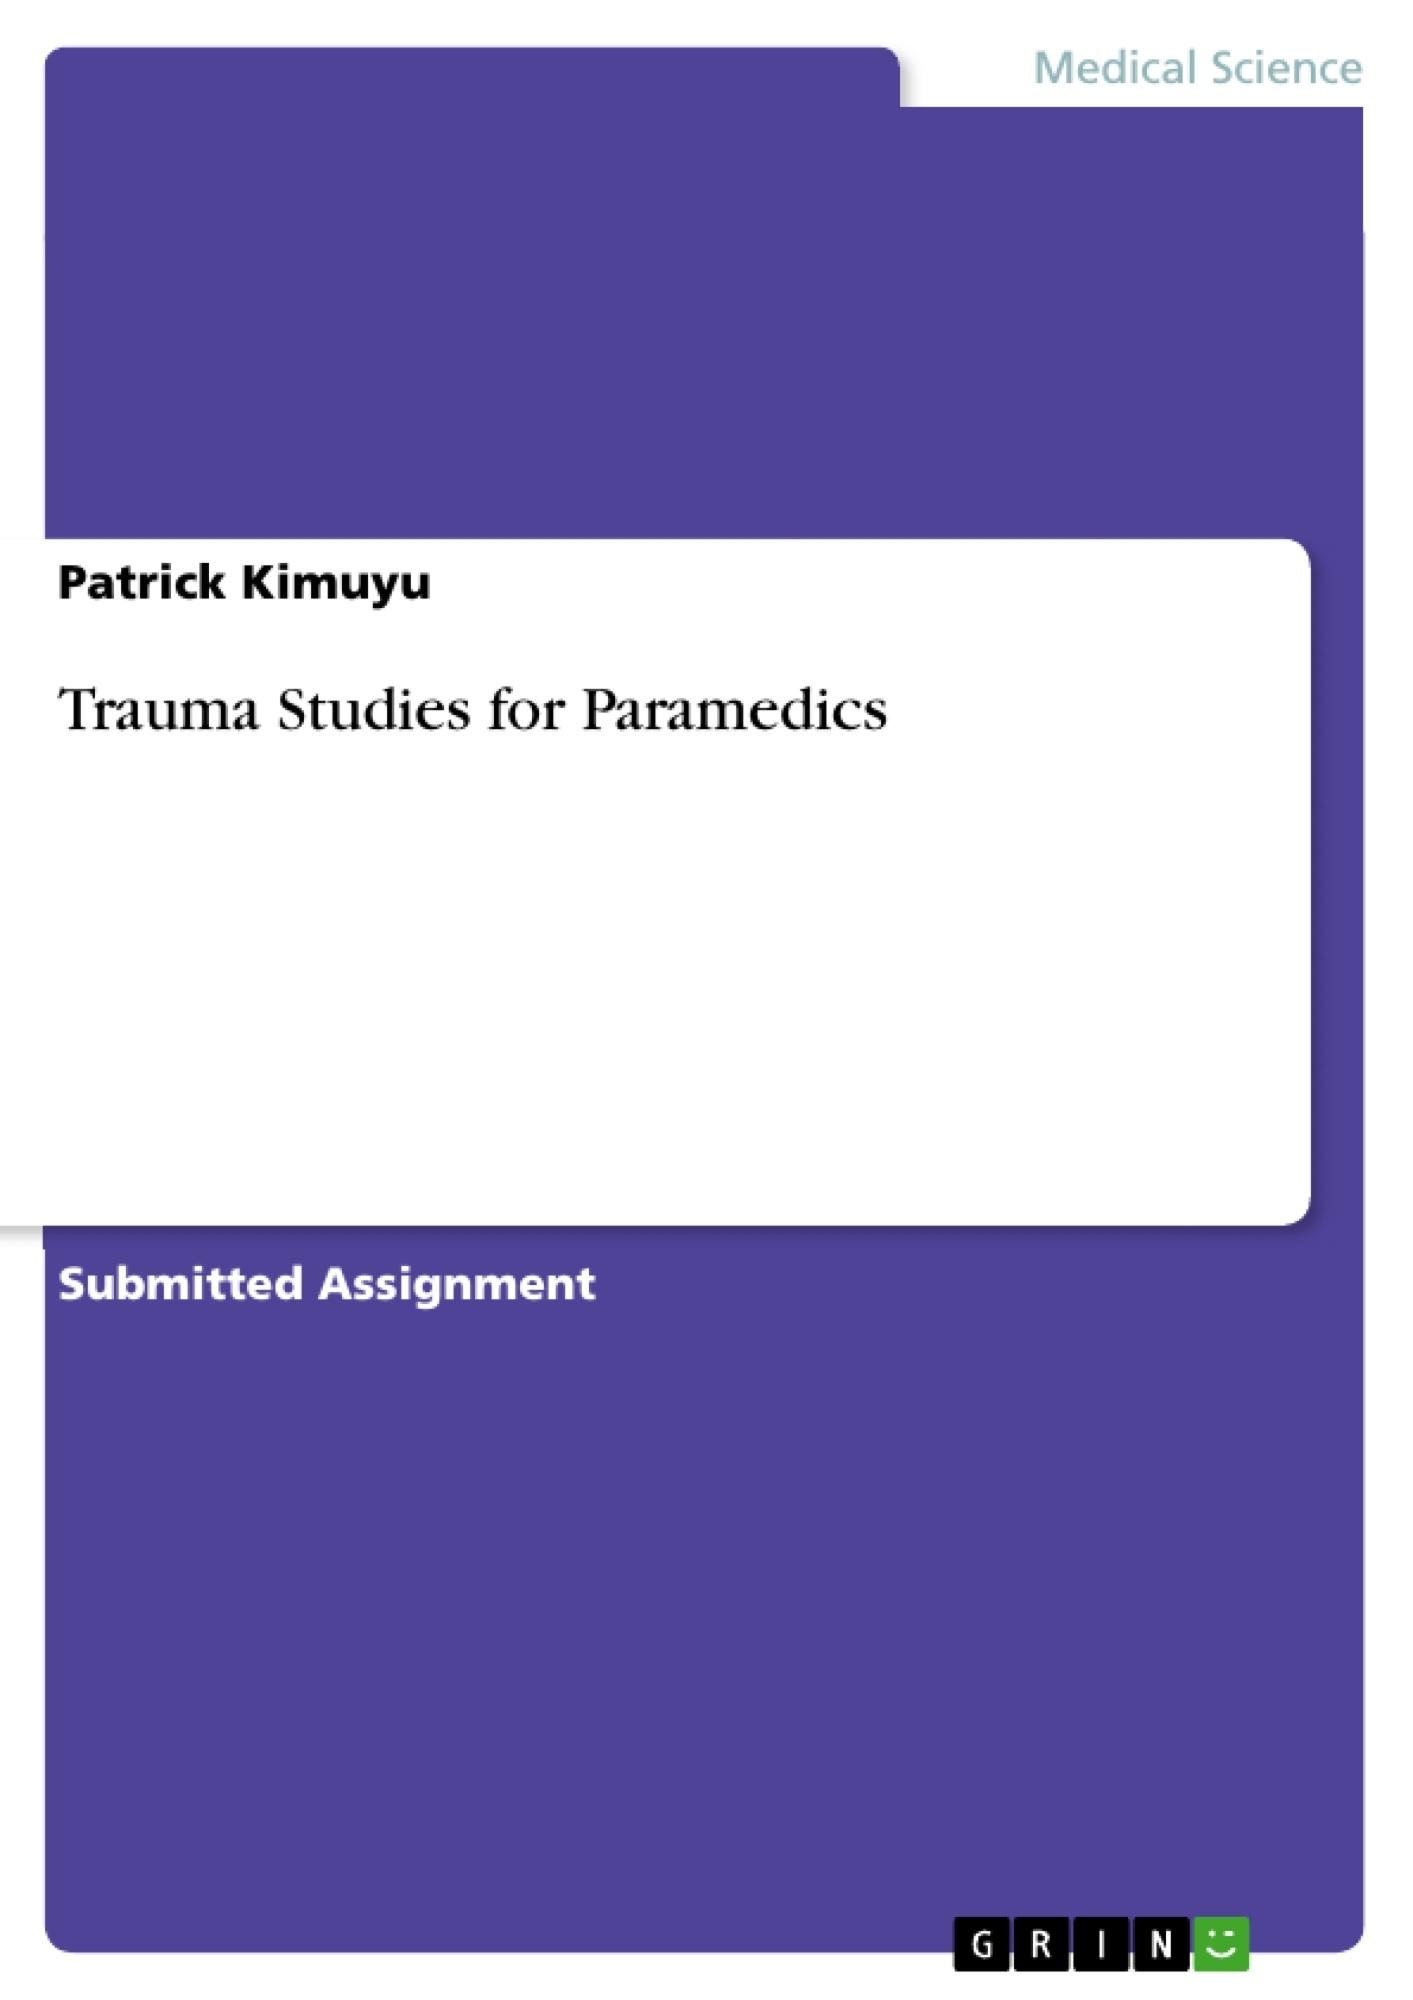 Title: Trauma Studies for Paramedics